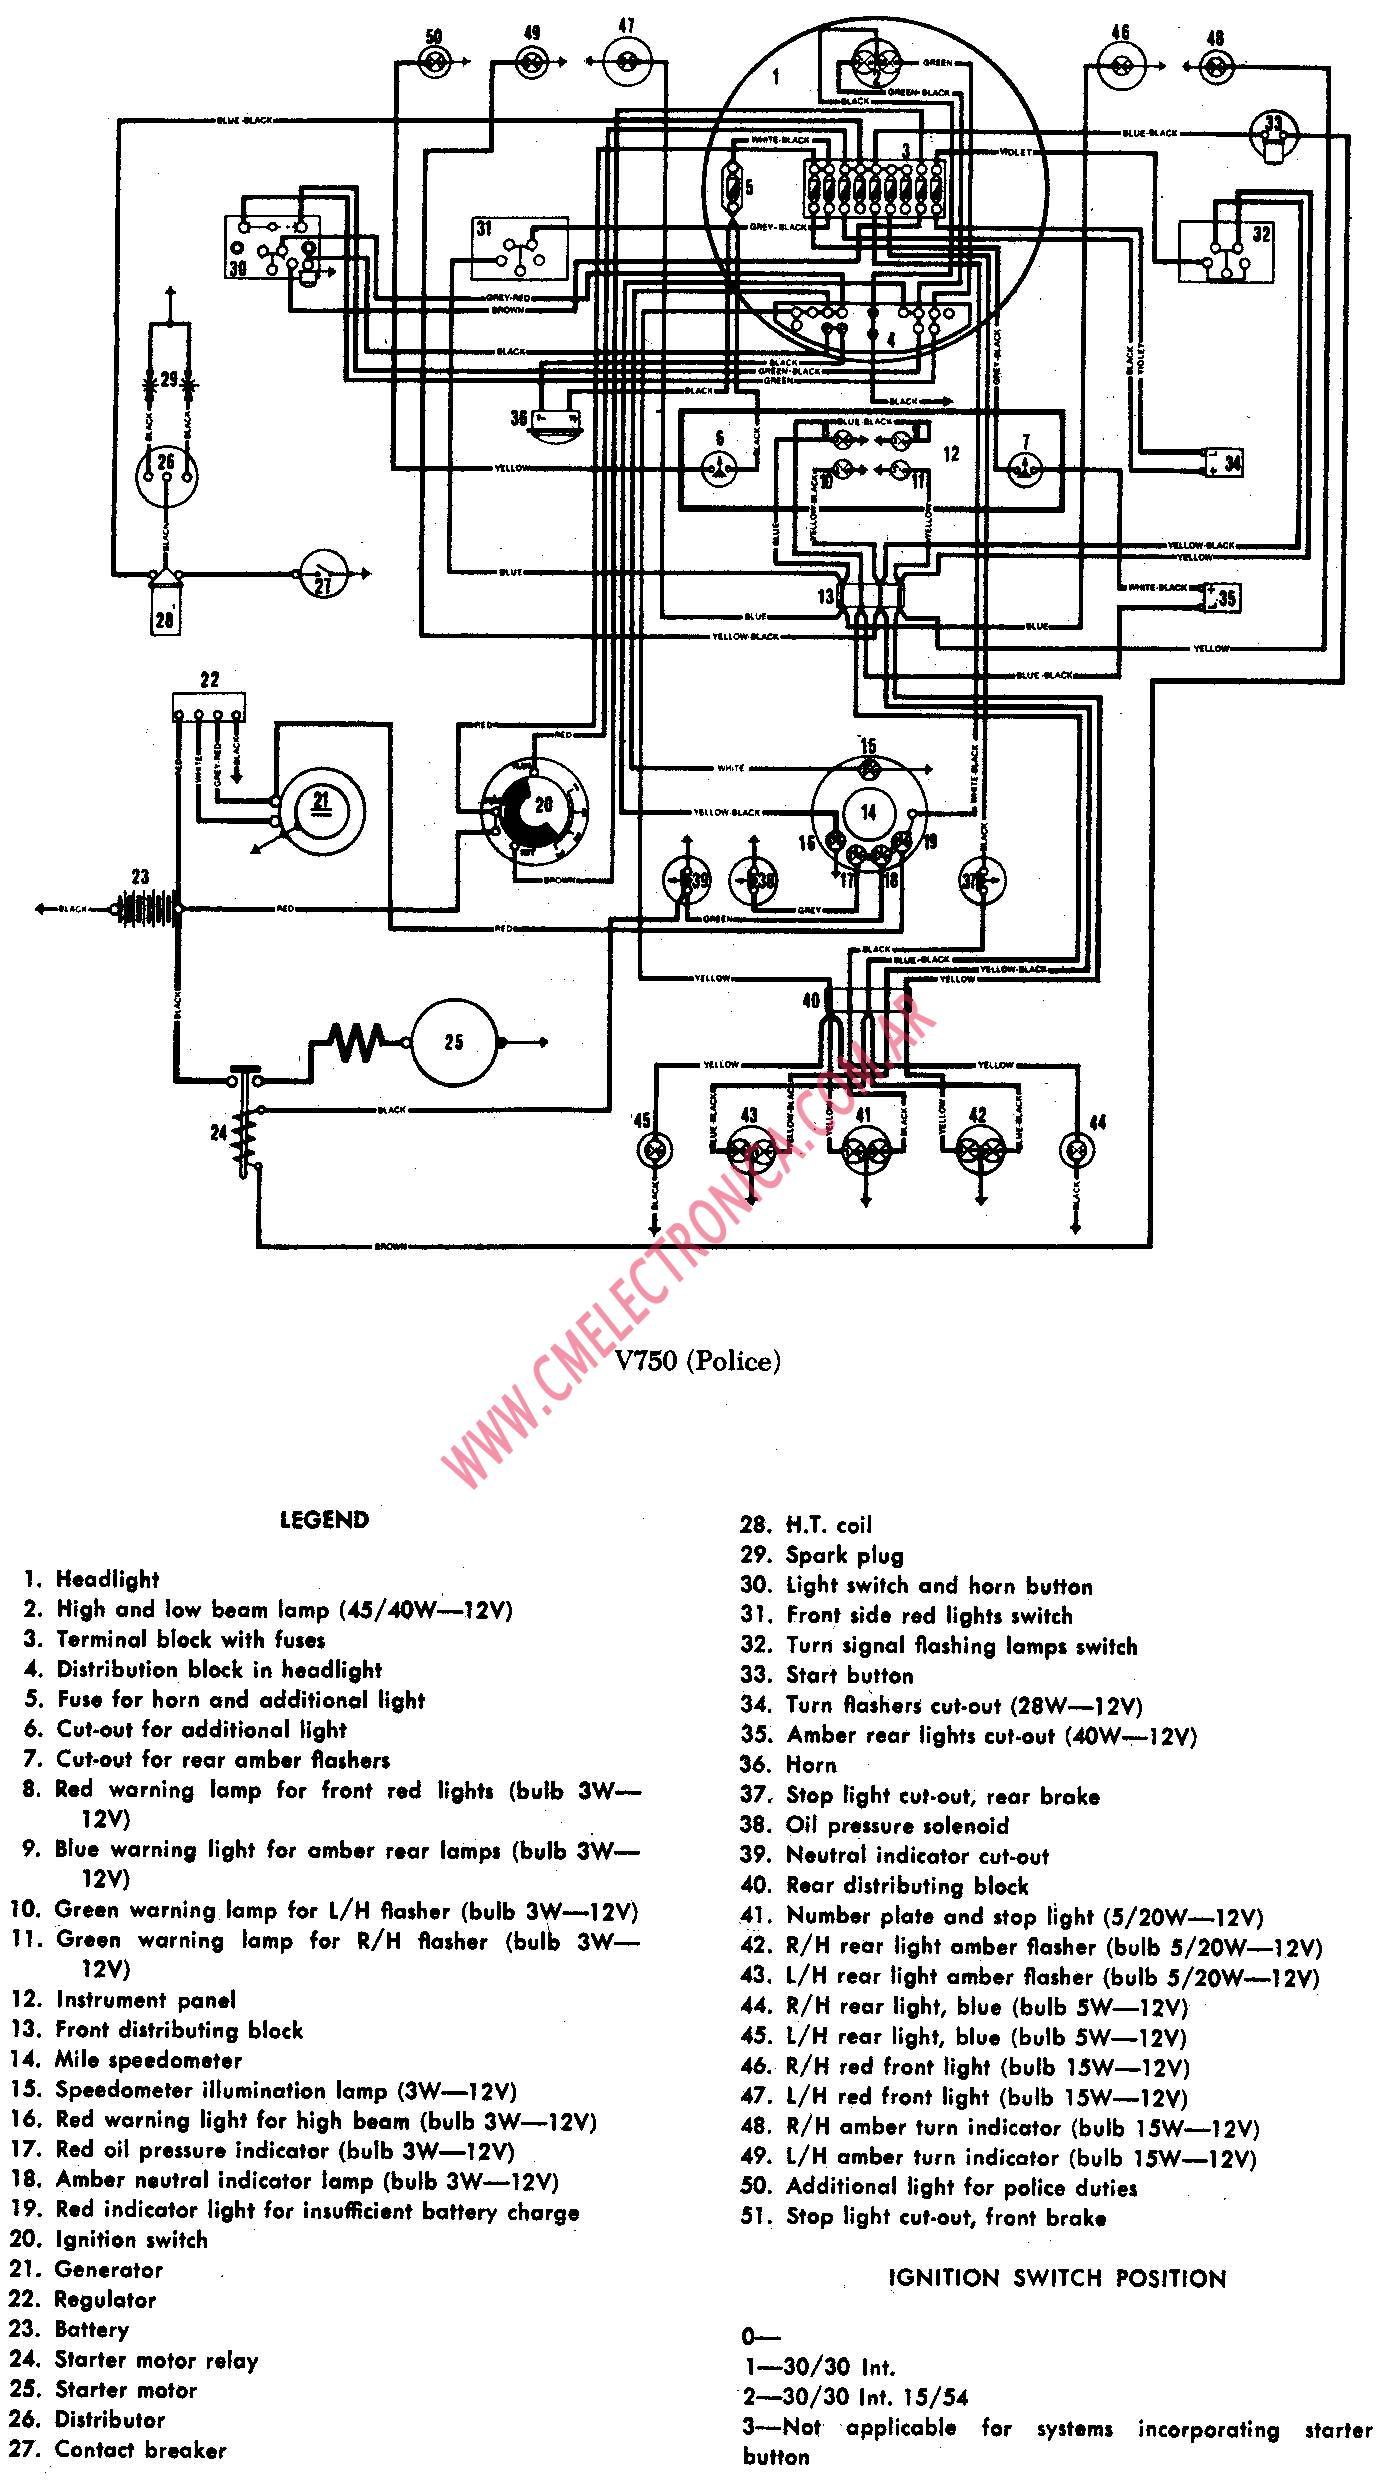 Honda Cr80 Engine Diagram. Honda. Auto Wiring Diagram